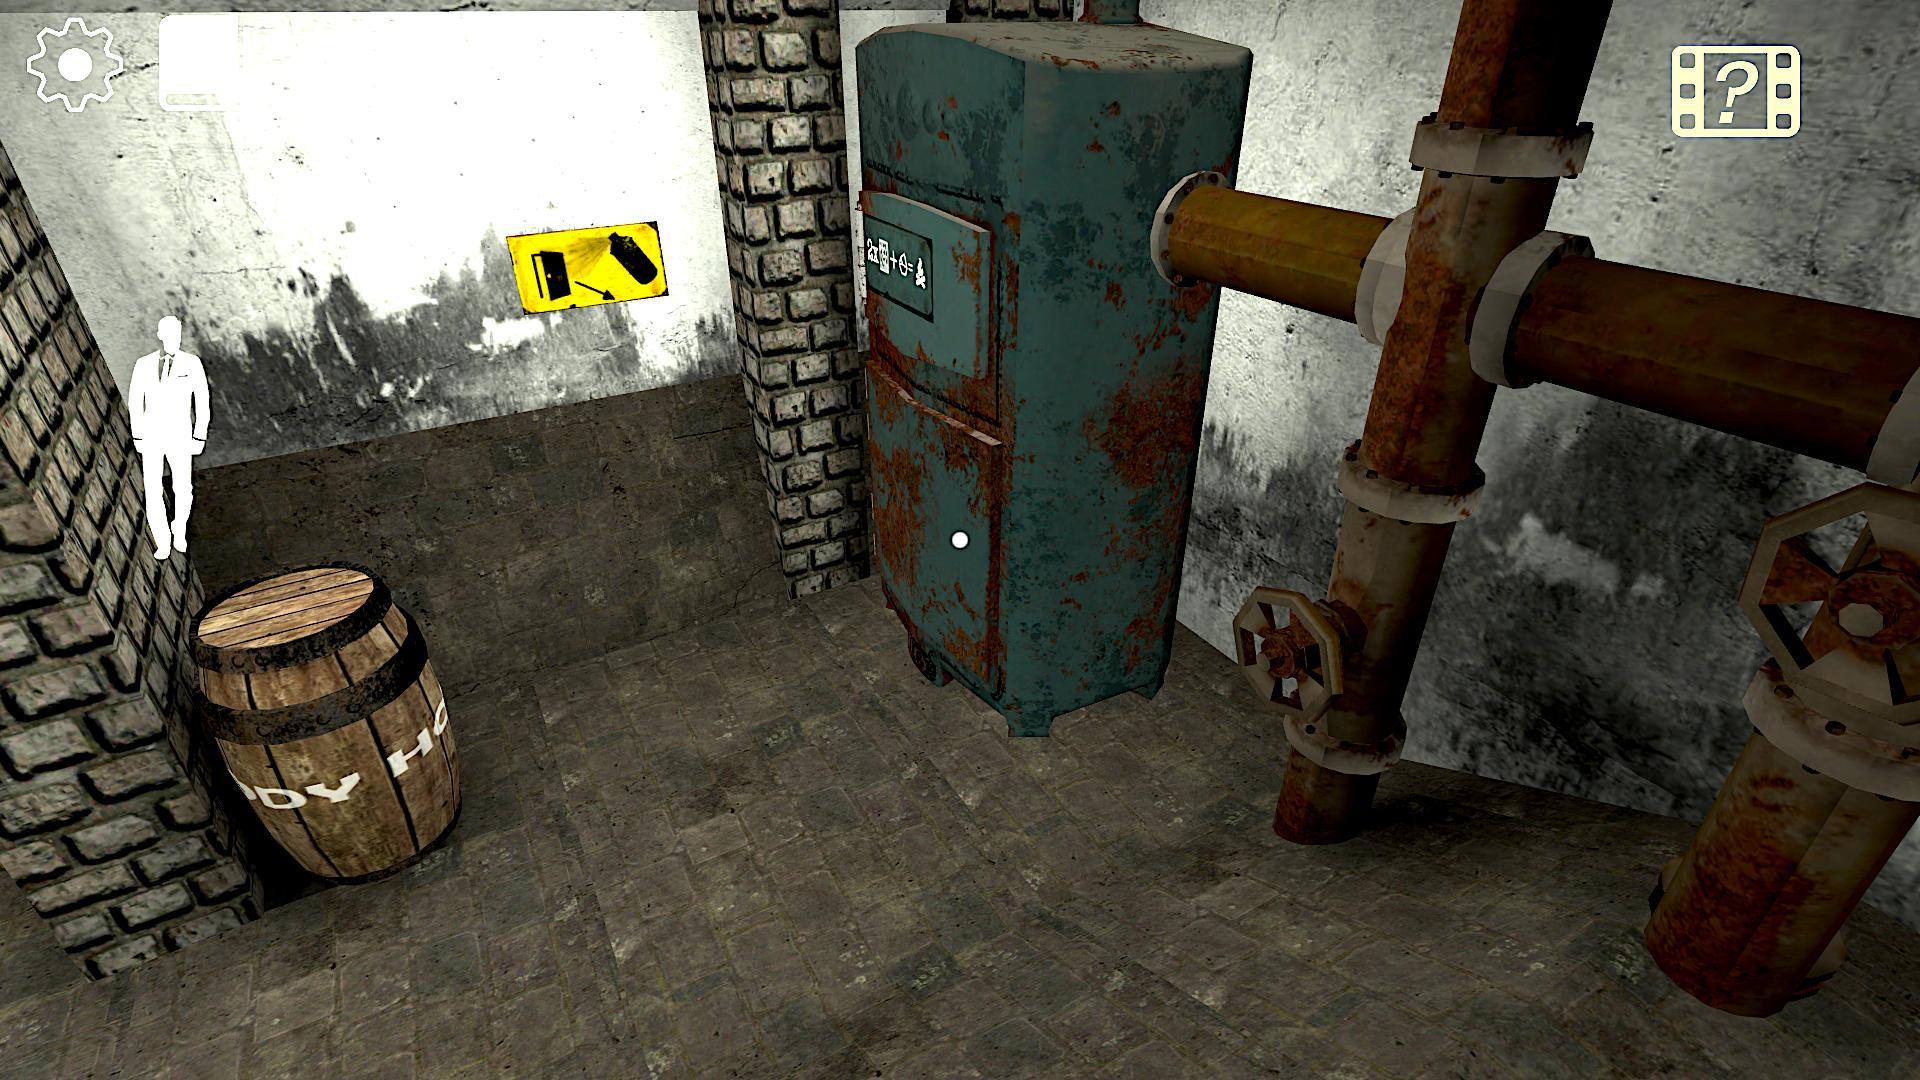 Evil Erich Sann : The New Horror Games. 2.5.0 Screenshot 12